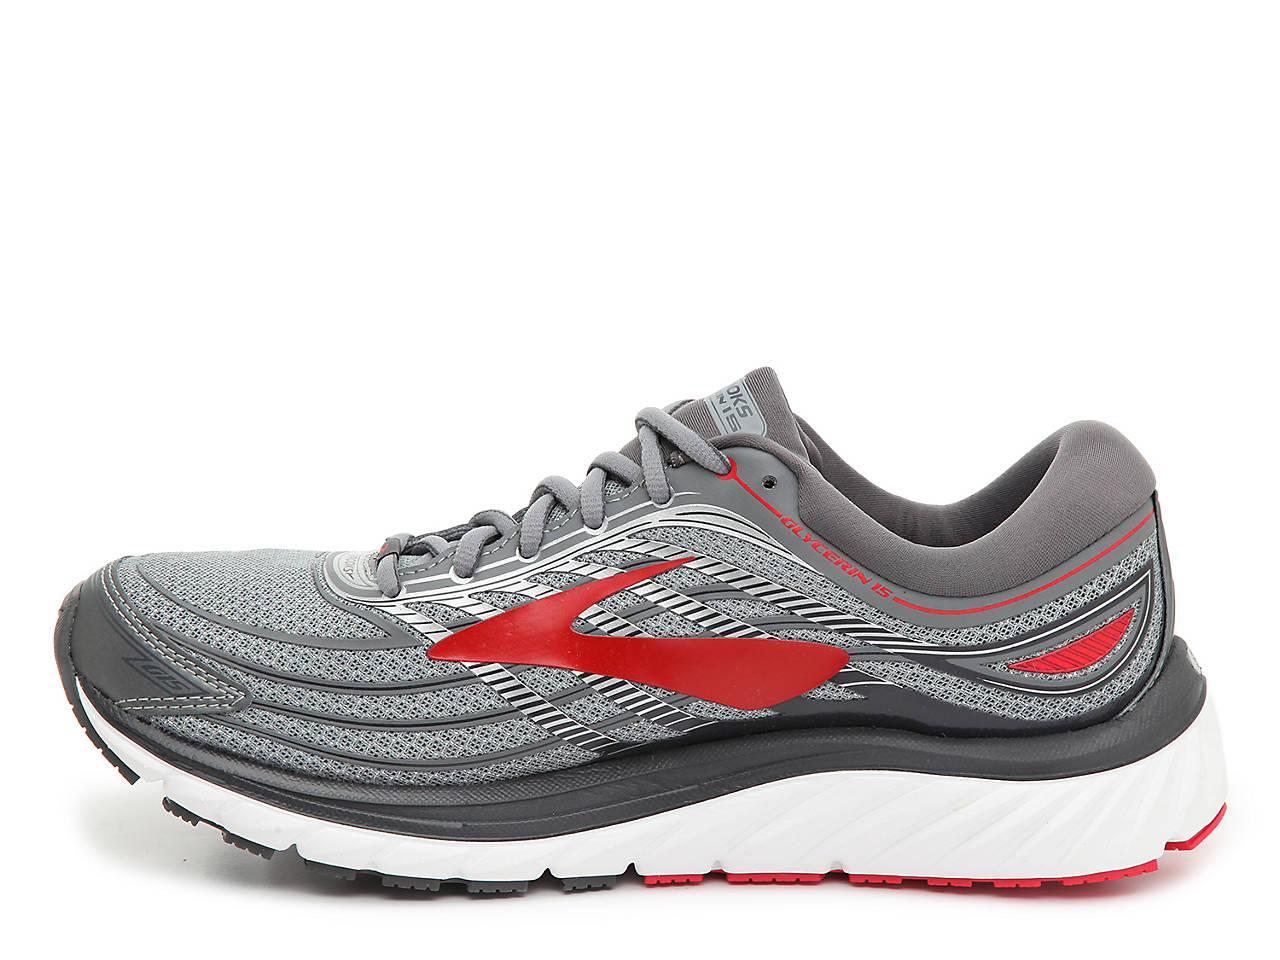 66dd1538691 Brooks Glycerin 15 Running Shoe - Men s Men s Shoes